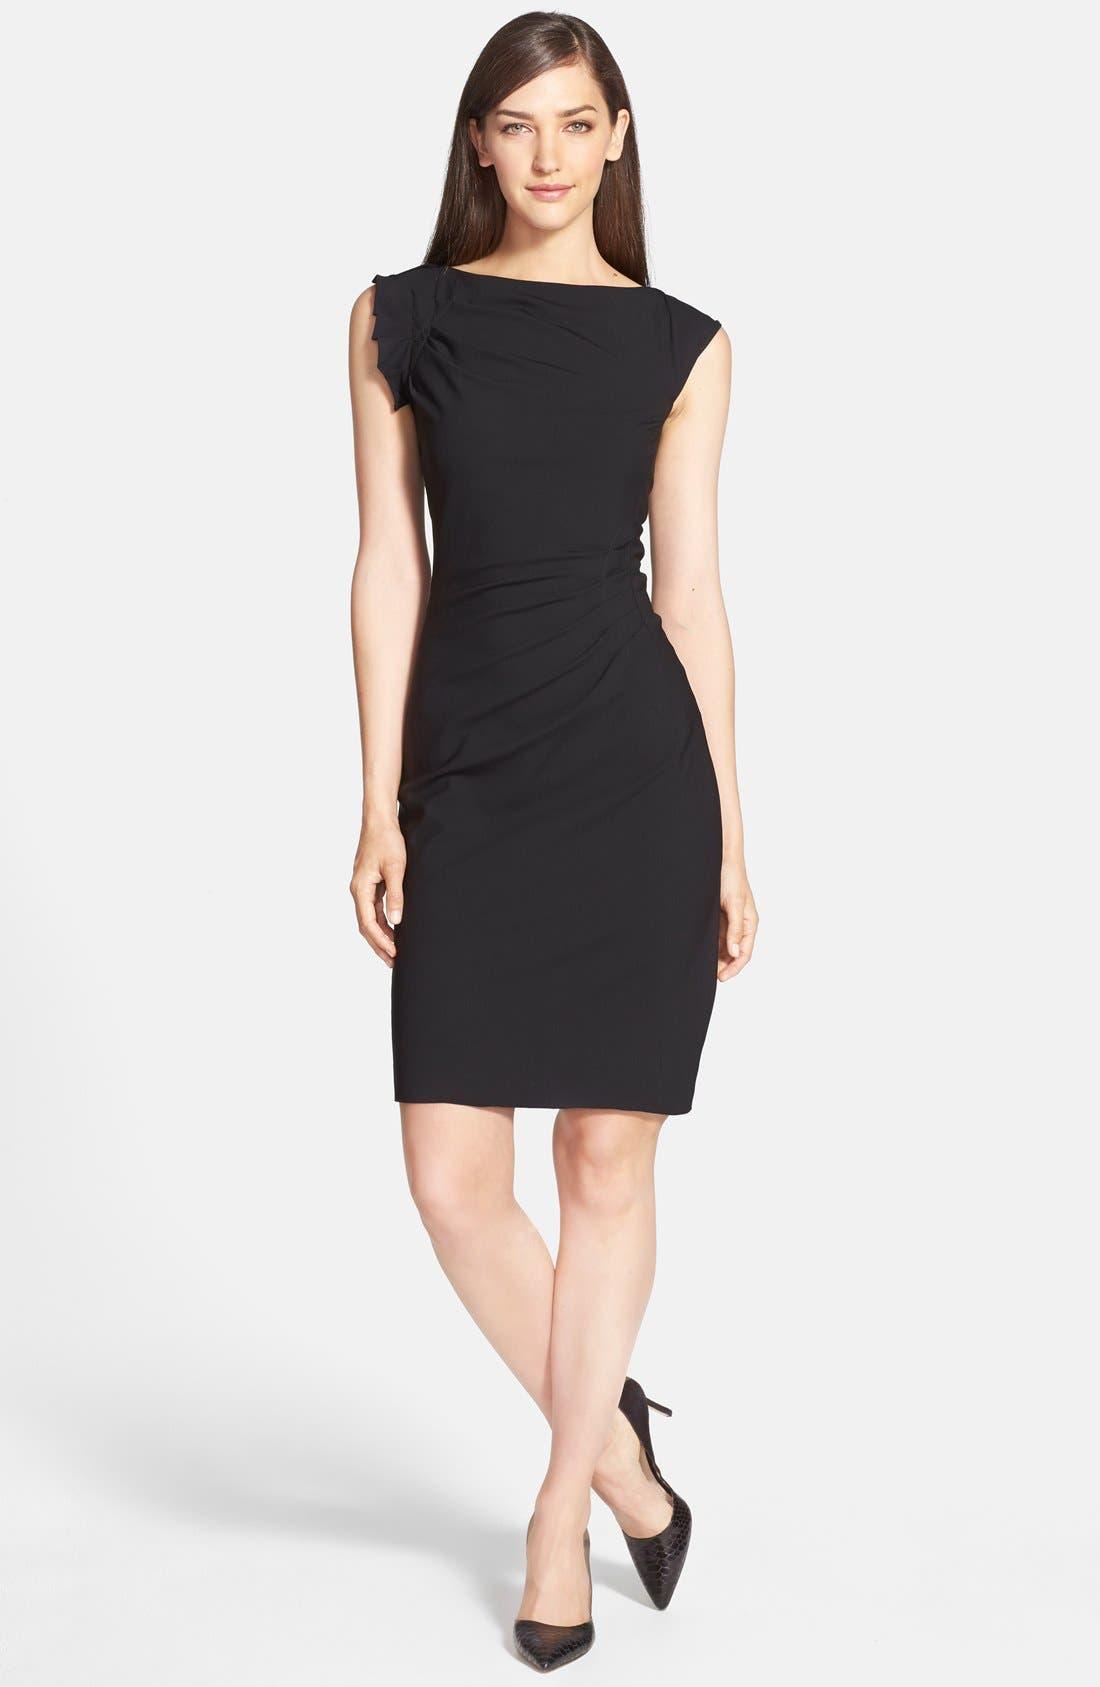 Alternate Image 1 Selected - BOSS 'Daperla' Dress